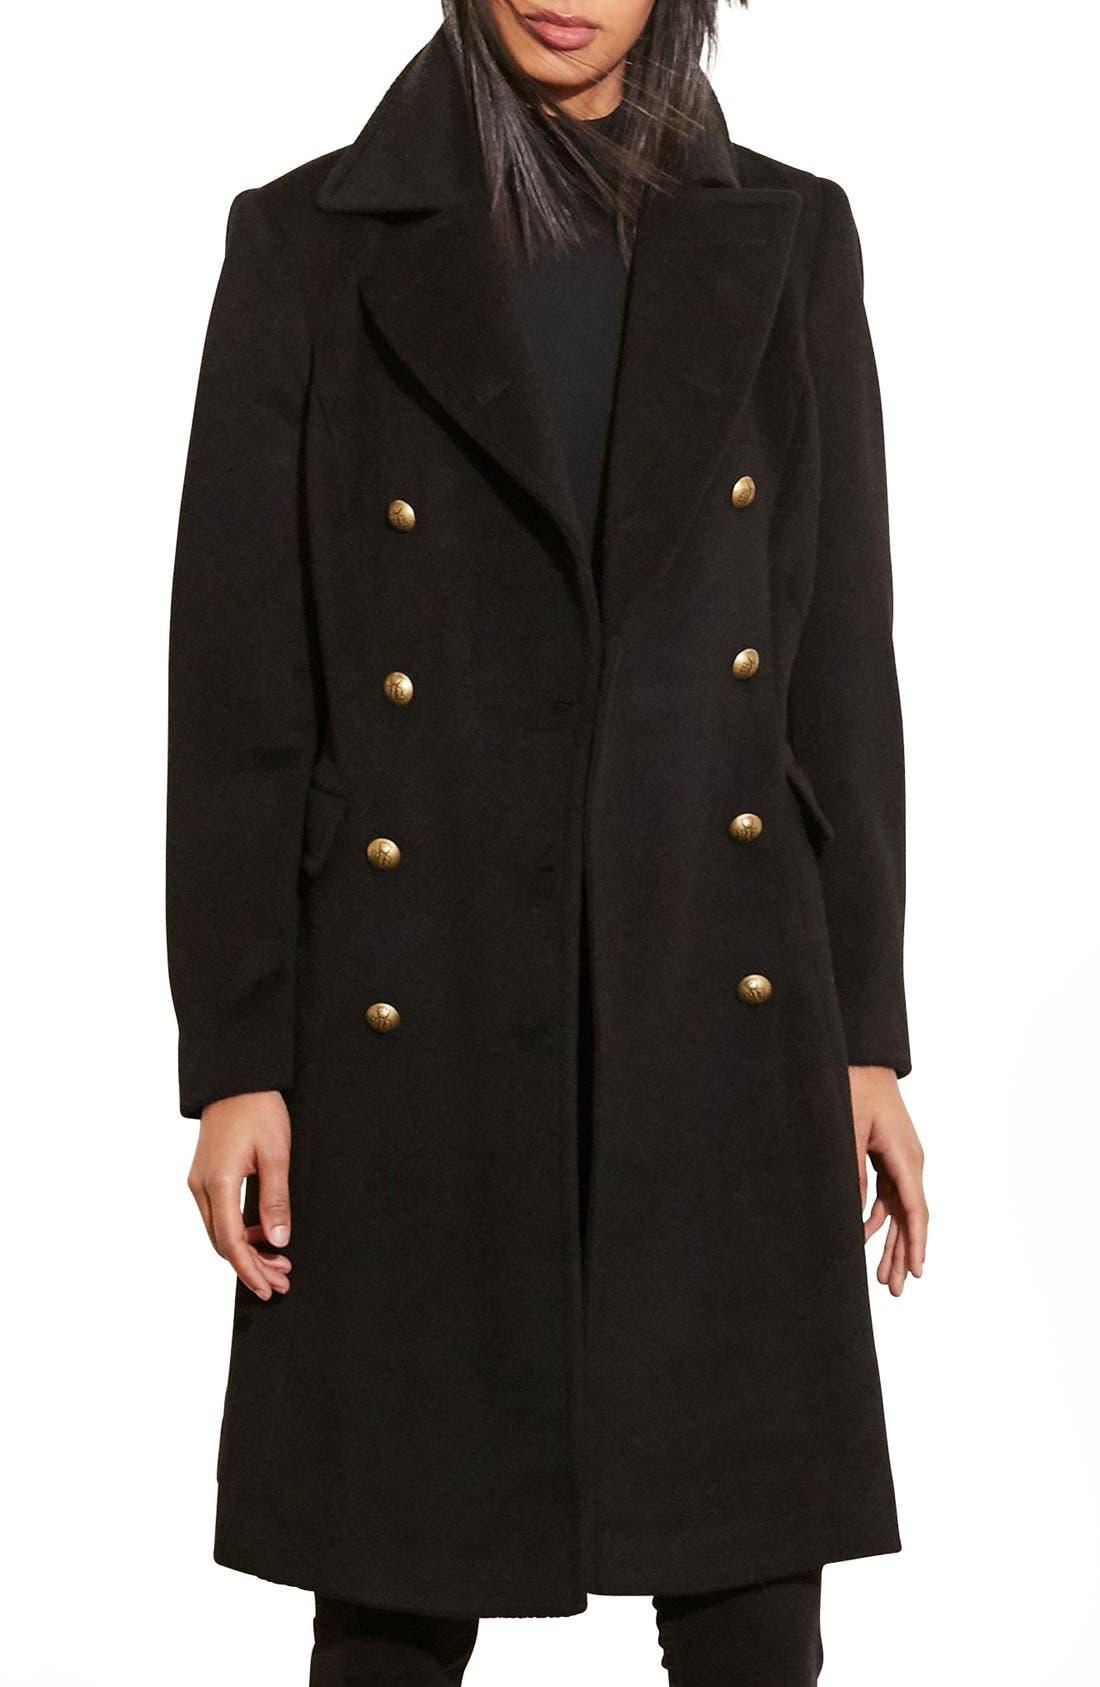 Alternate Image 1 Selected - Lauren Ralph Lauren Skirted Wool Blend Military Coat